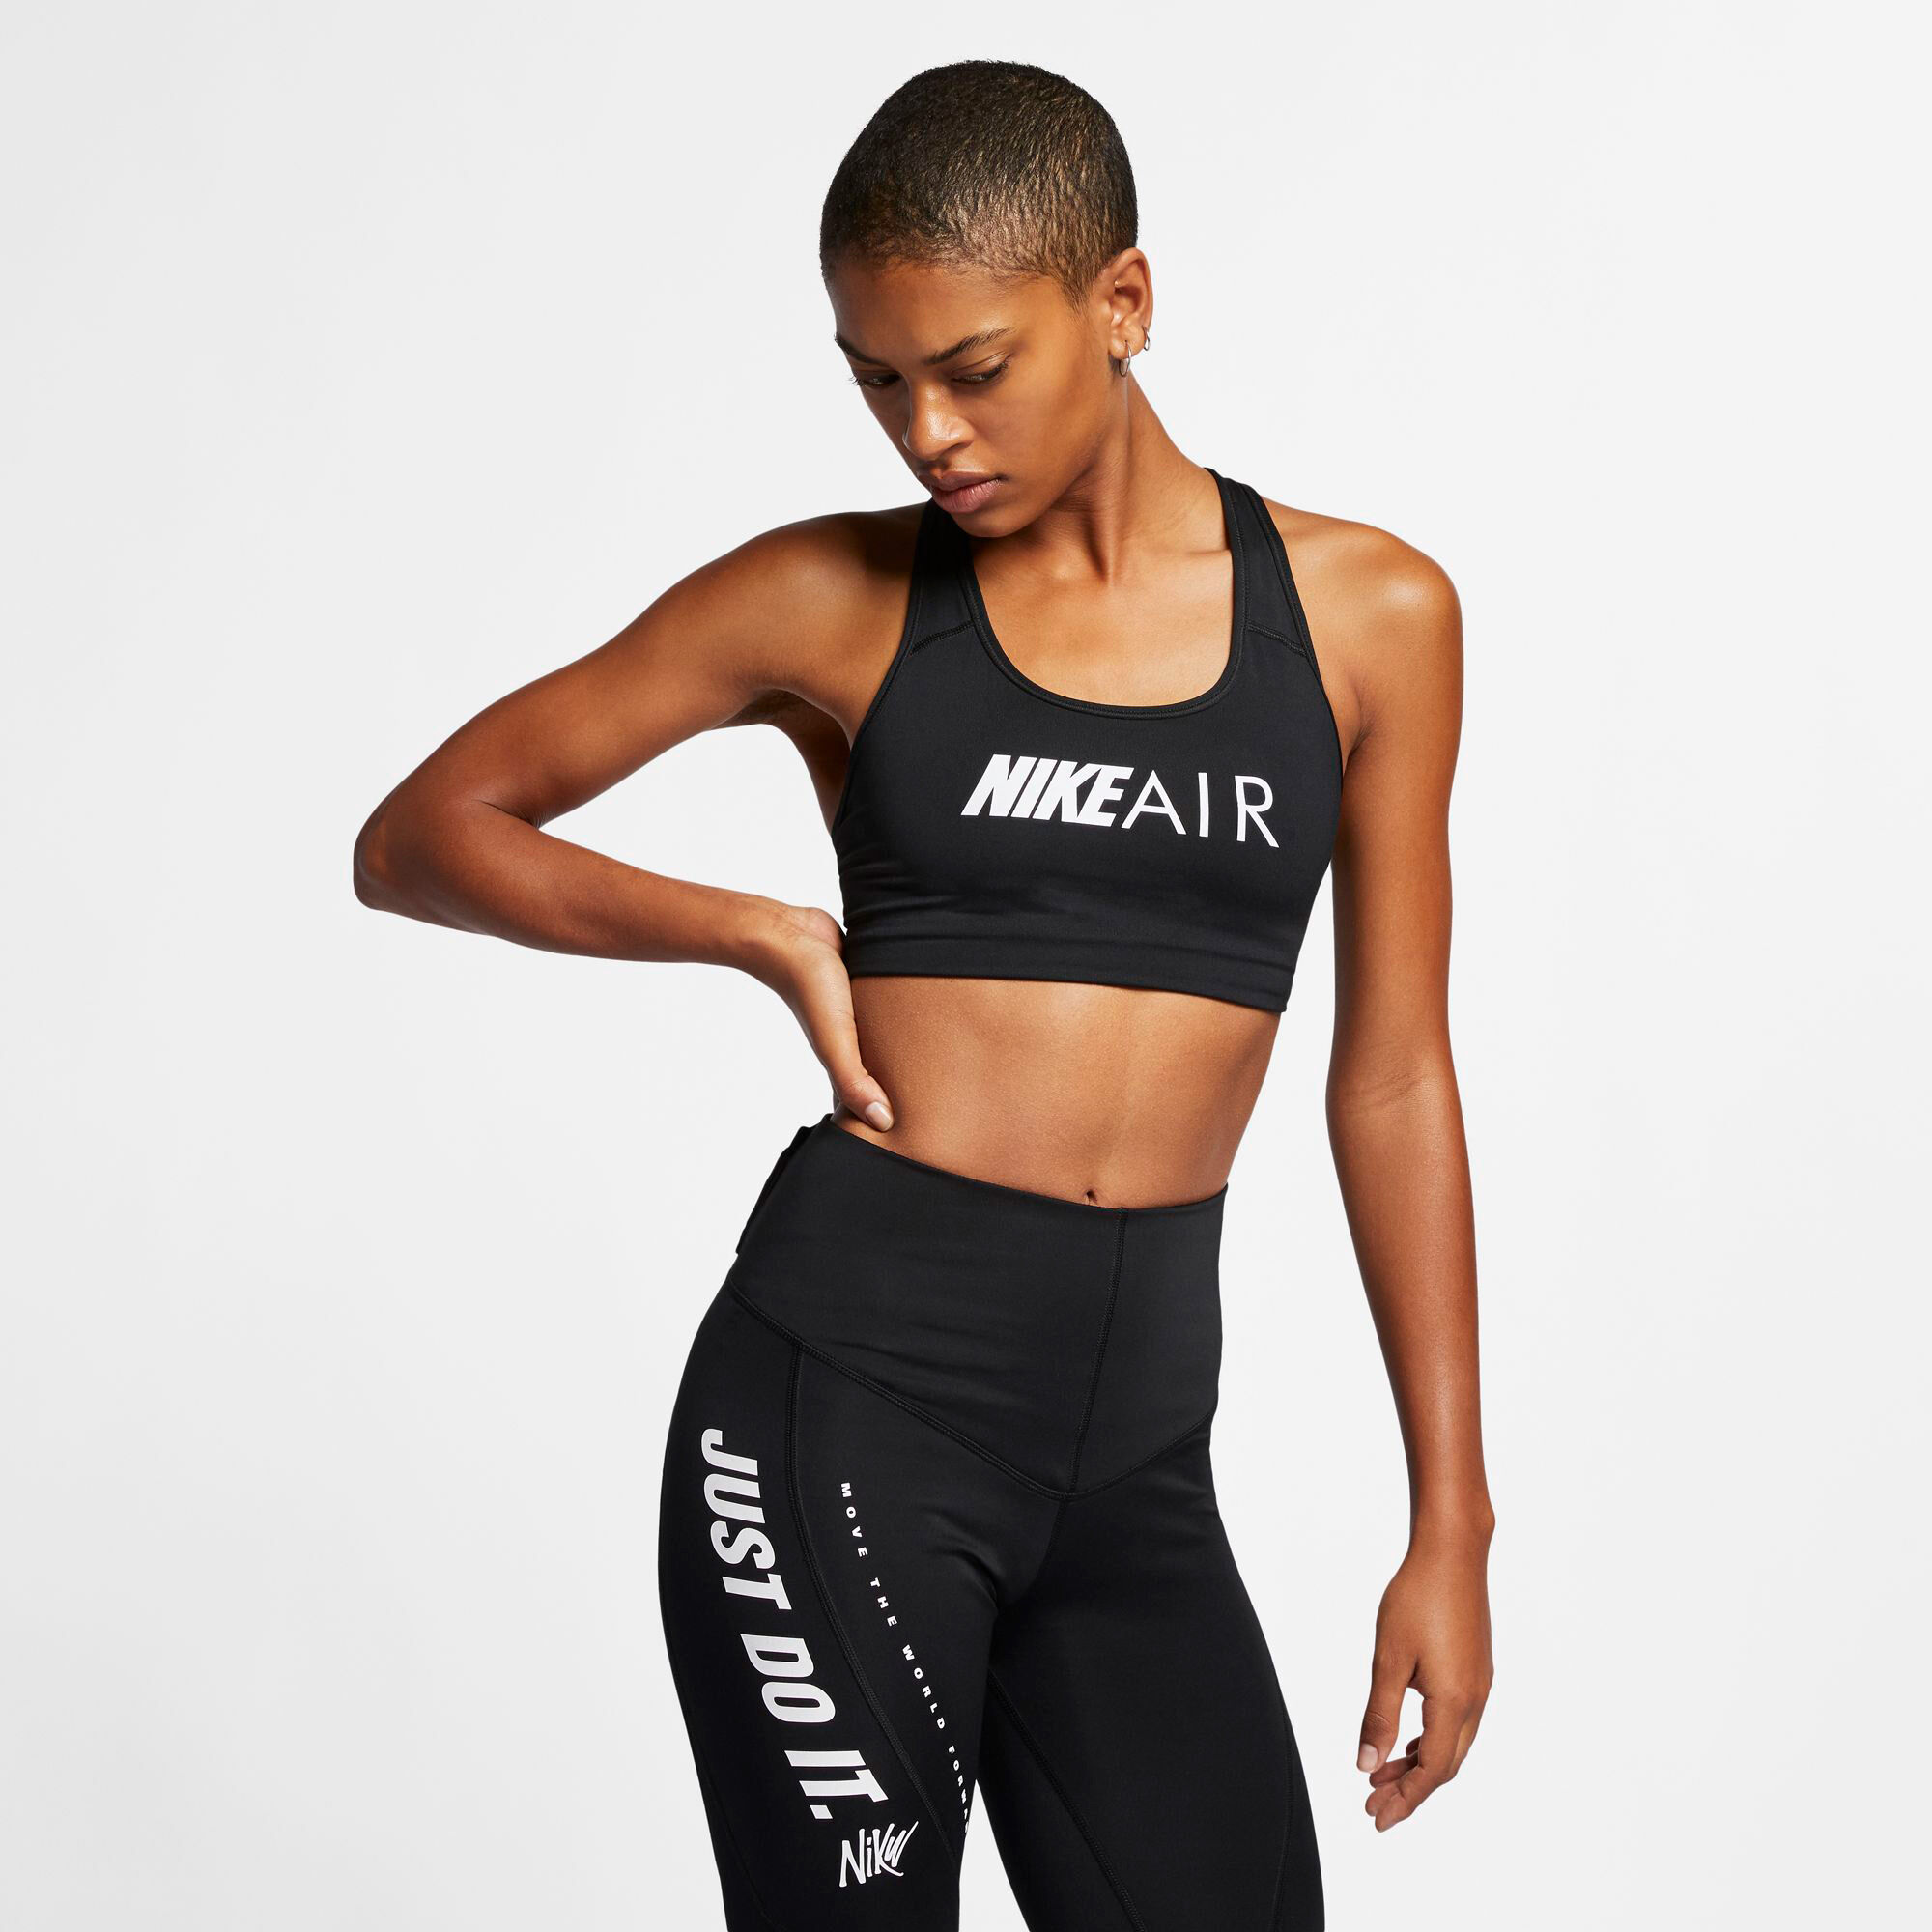 Nike Sportkleding & Accessoires | INTERSPORT